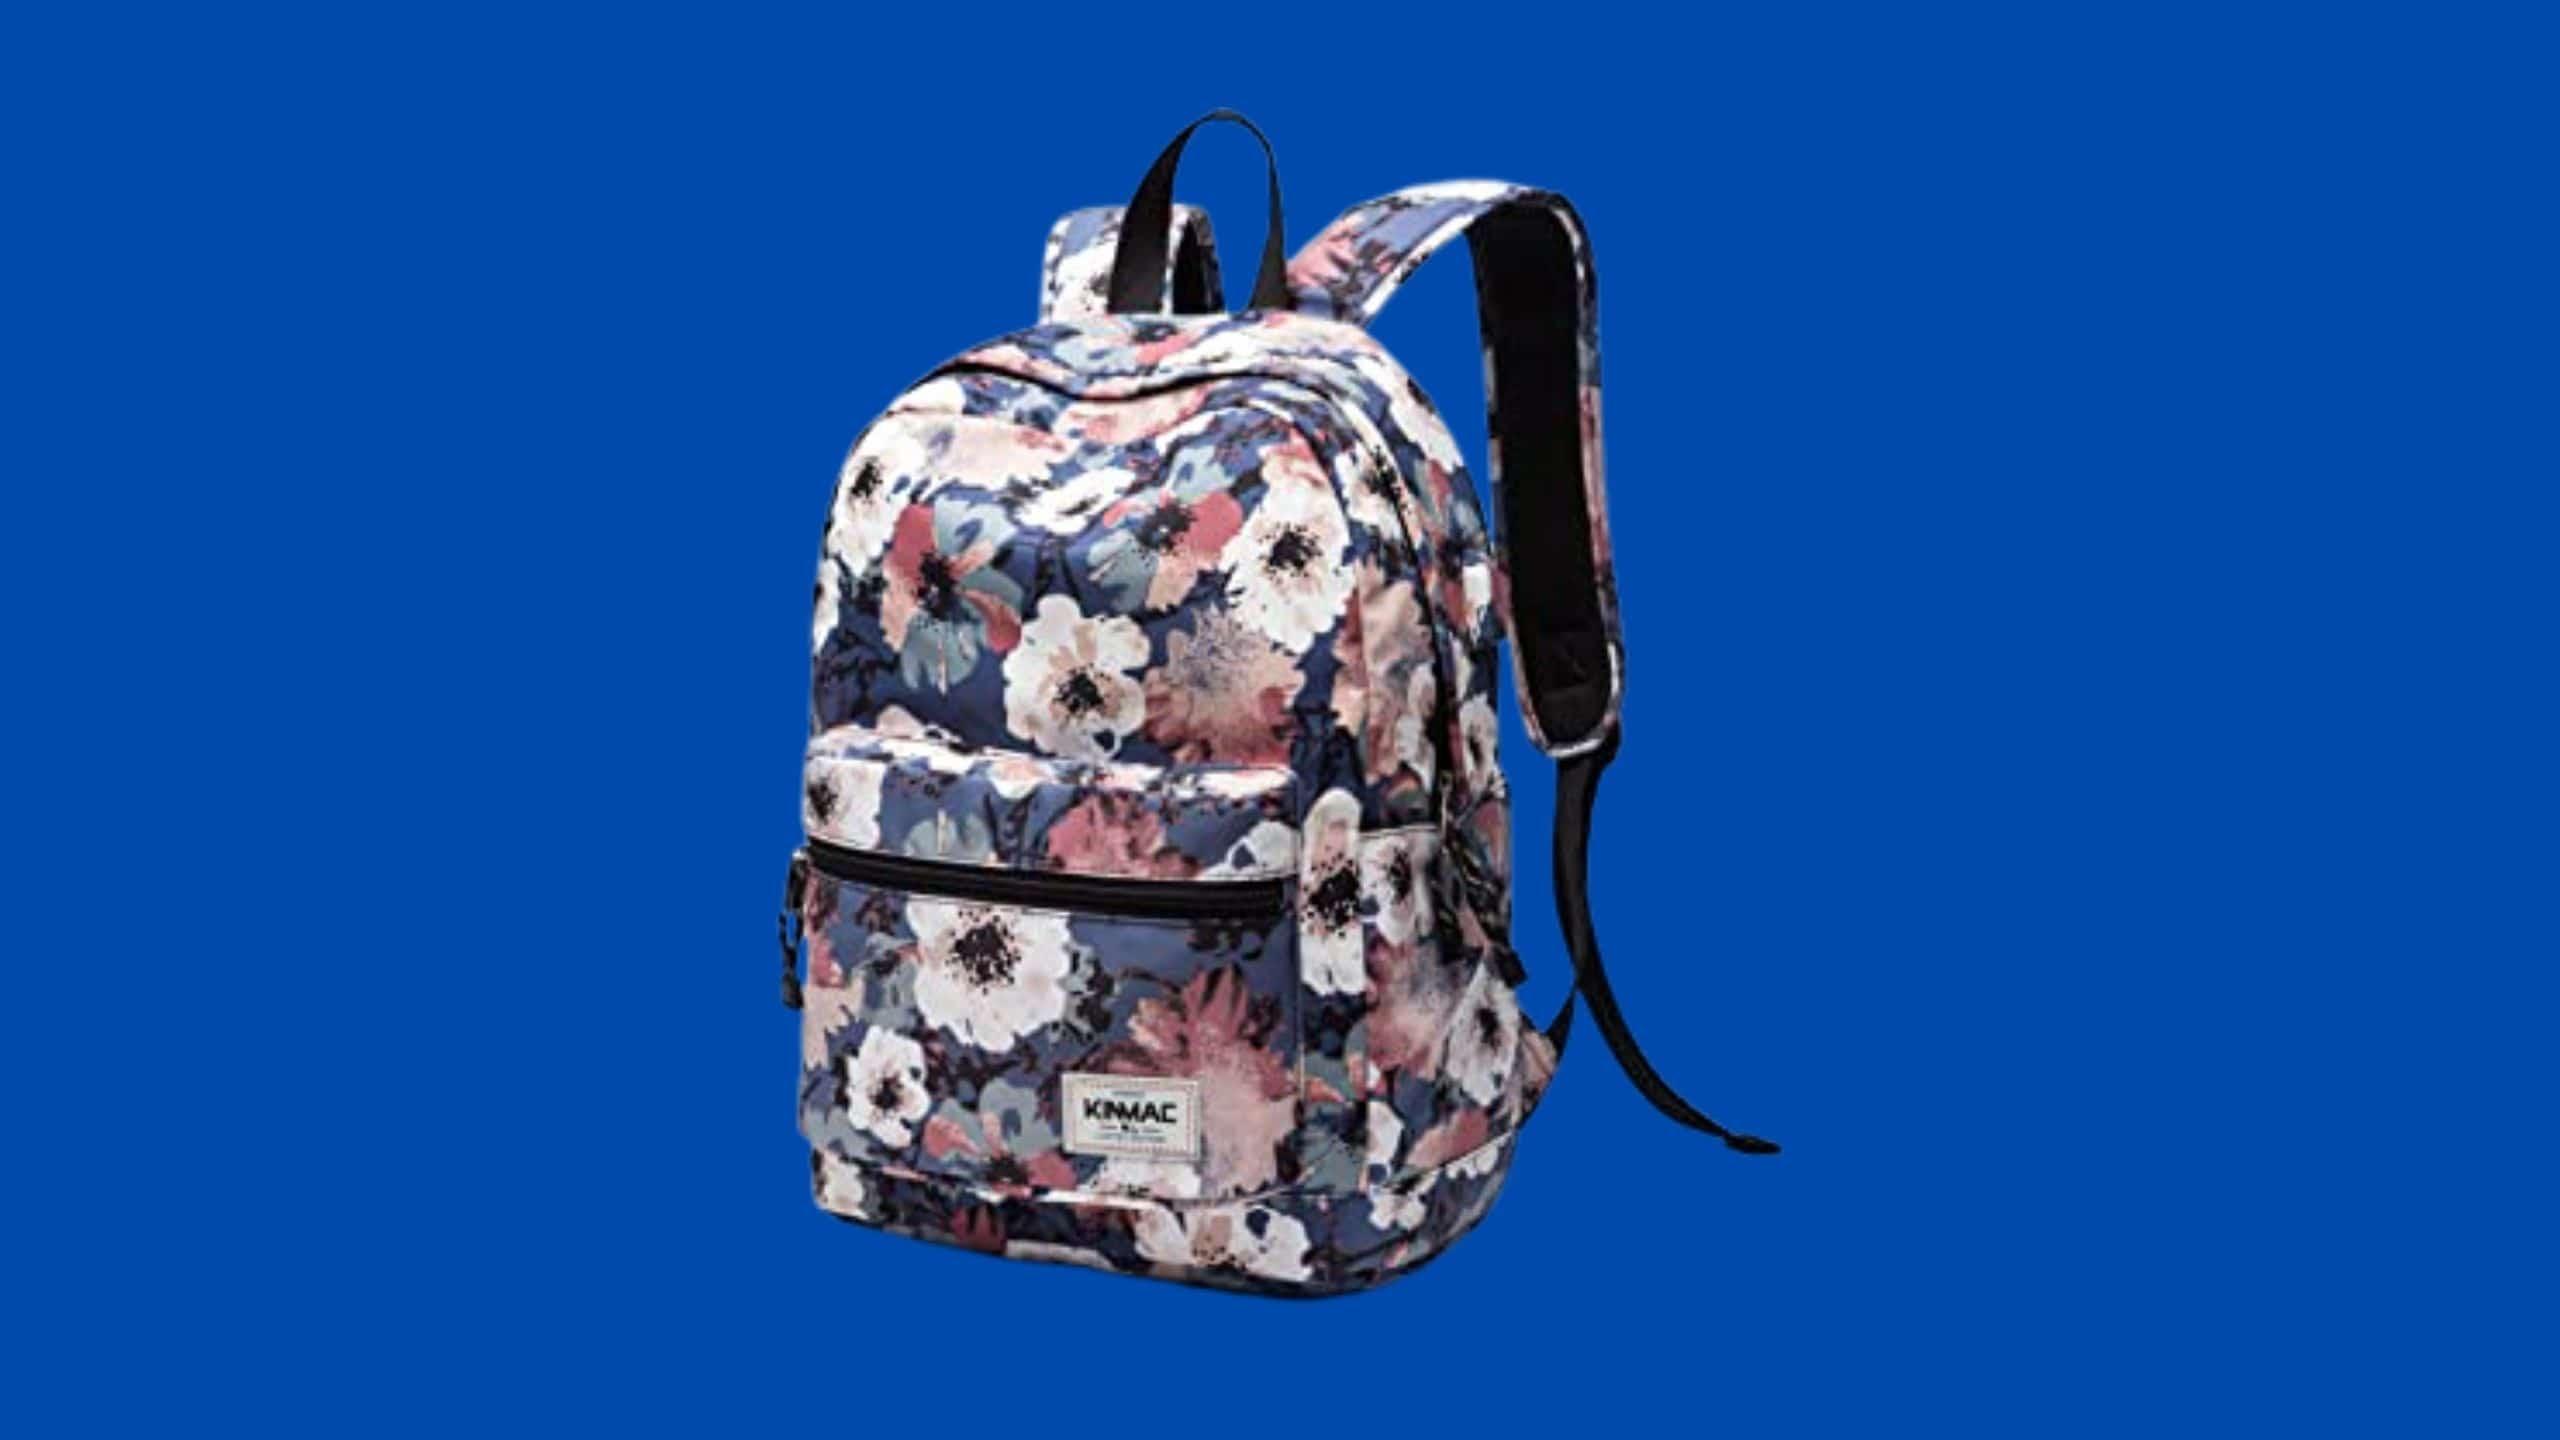 Bohemian Waterproof Backpack for Music Festivals by Kinmac